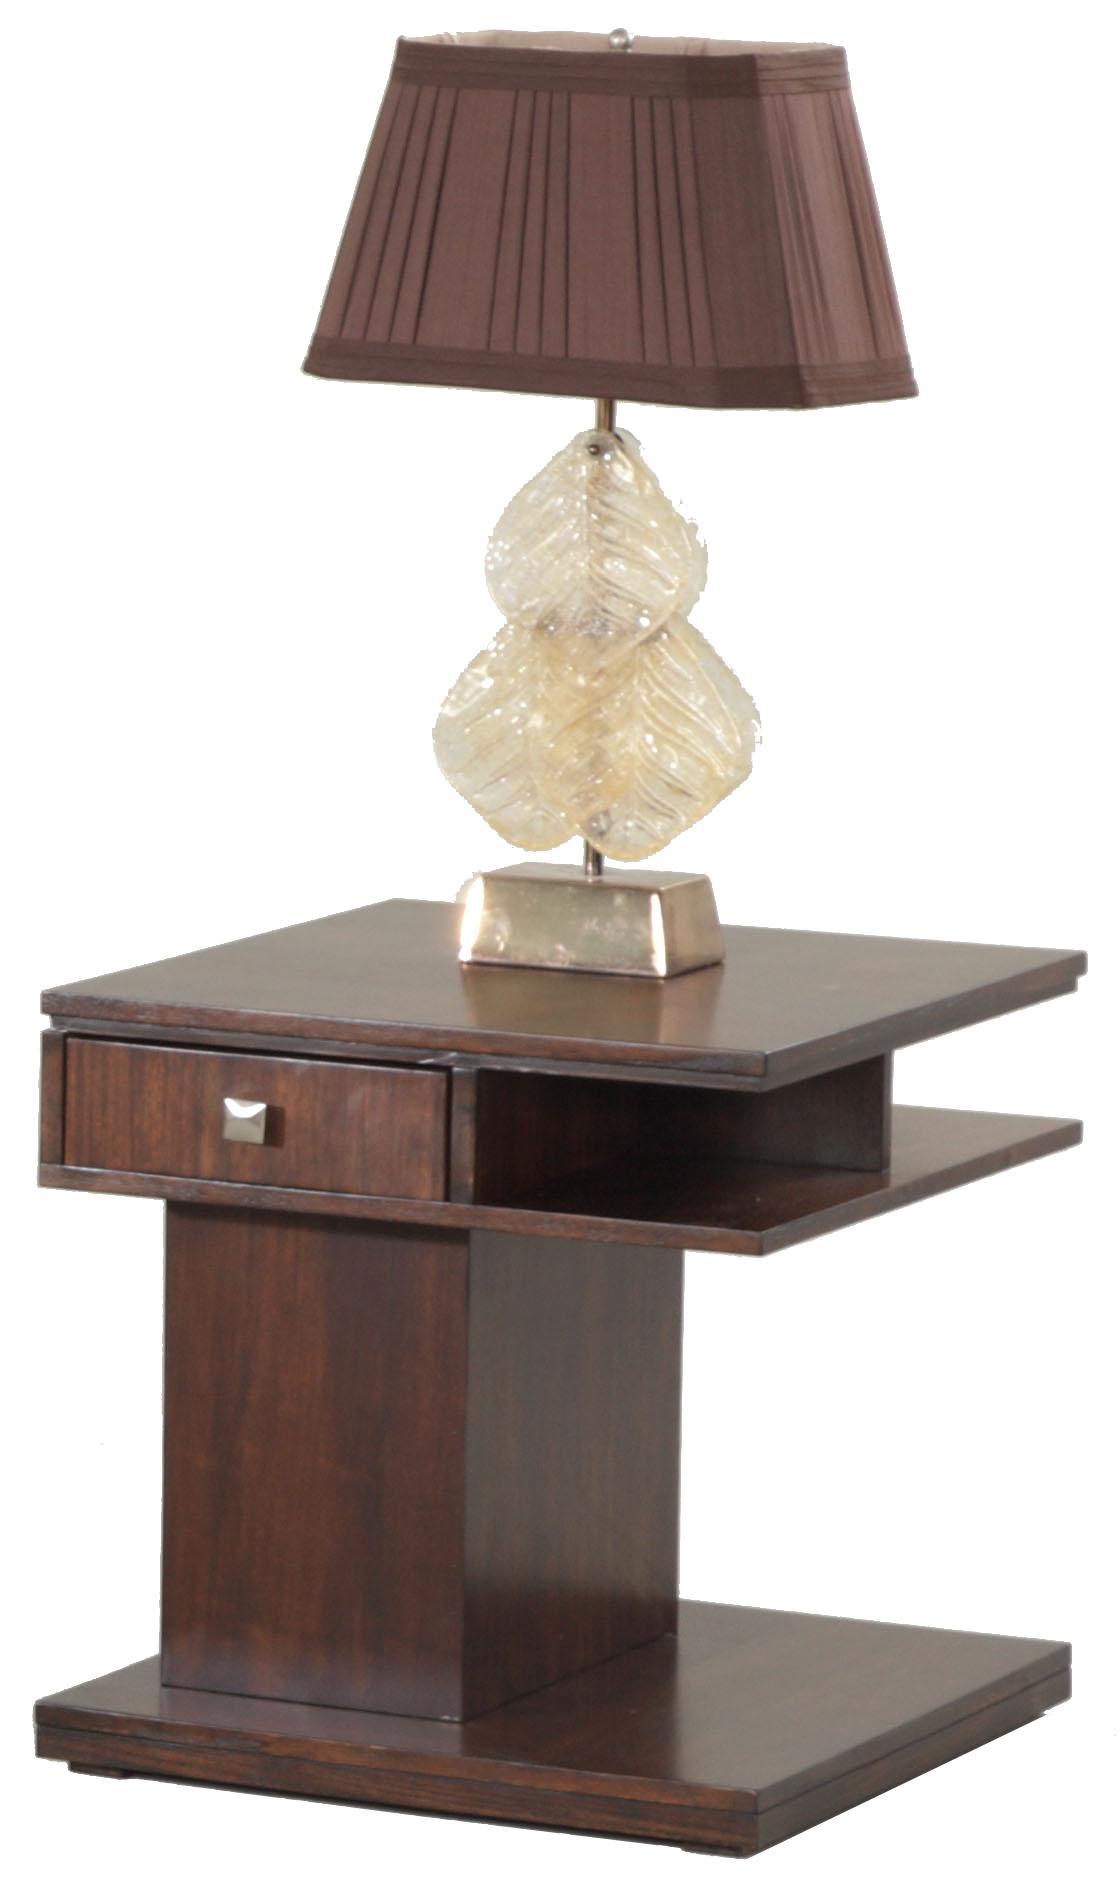 Progressive Furniture Le Mans Rectangular End Table - Item Number: P561-04